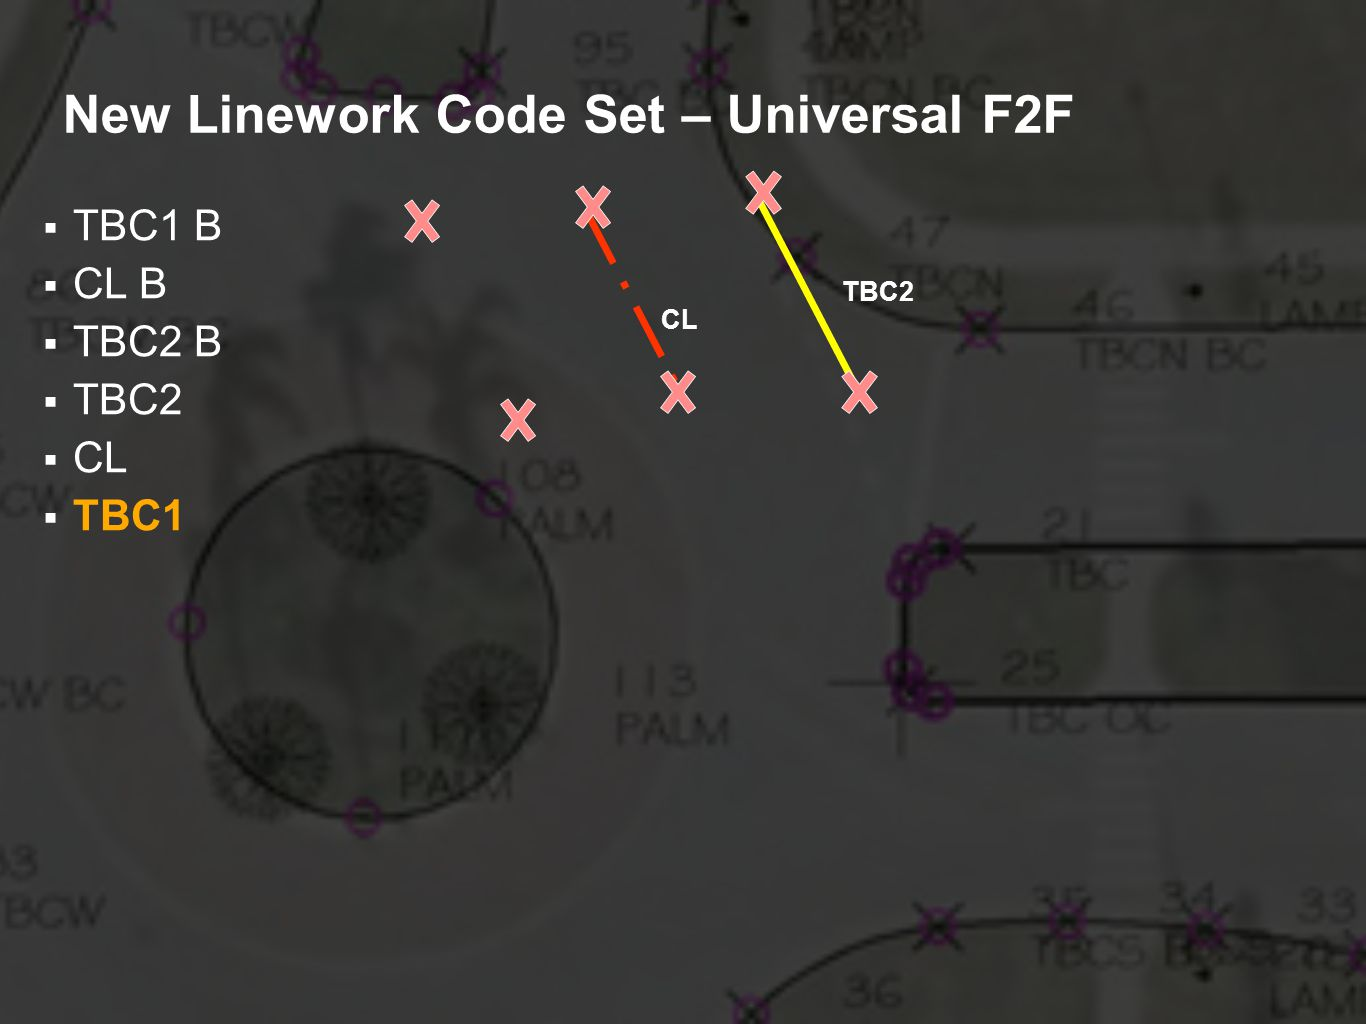 New Linework Code Set – Universal F2F TBC1 B CL B TBC2 B TBC2 CL TBC1 TBC2 CL